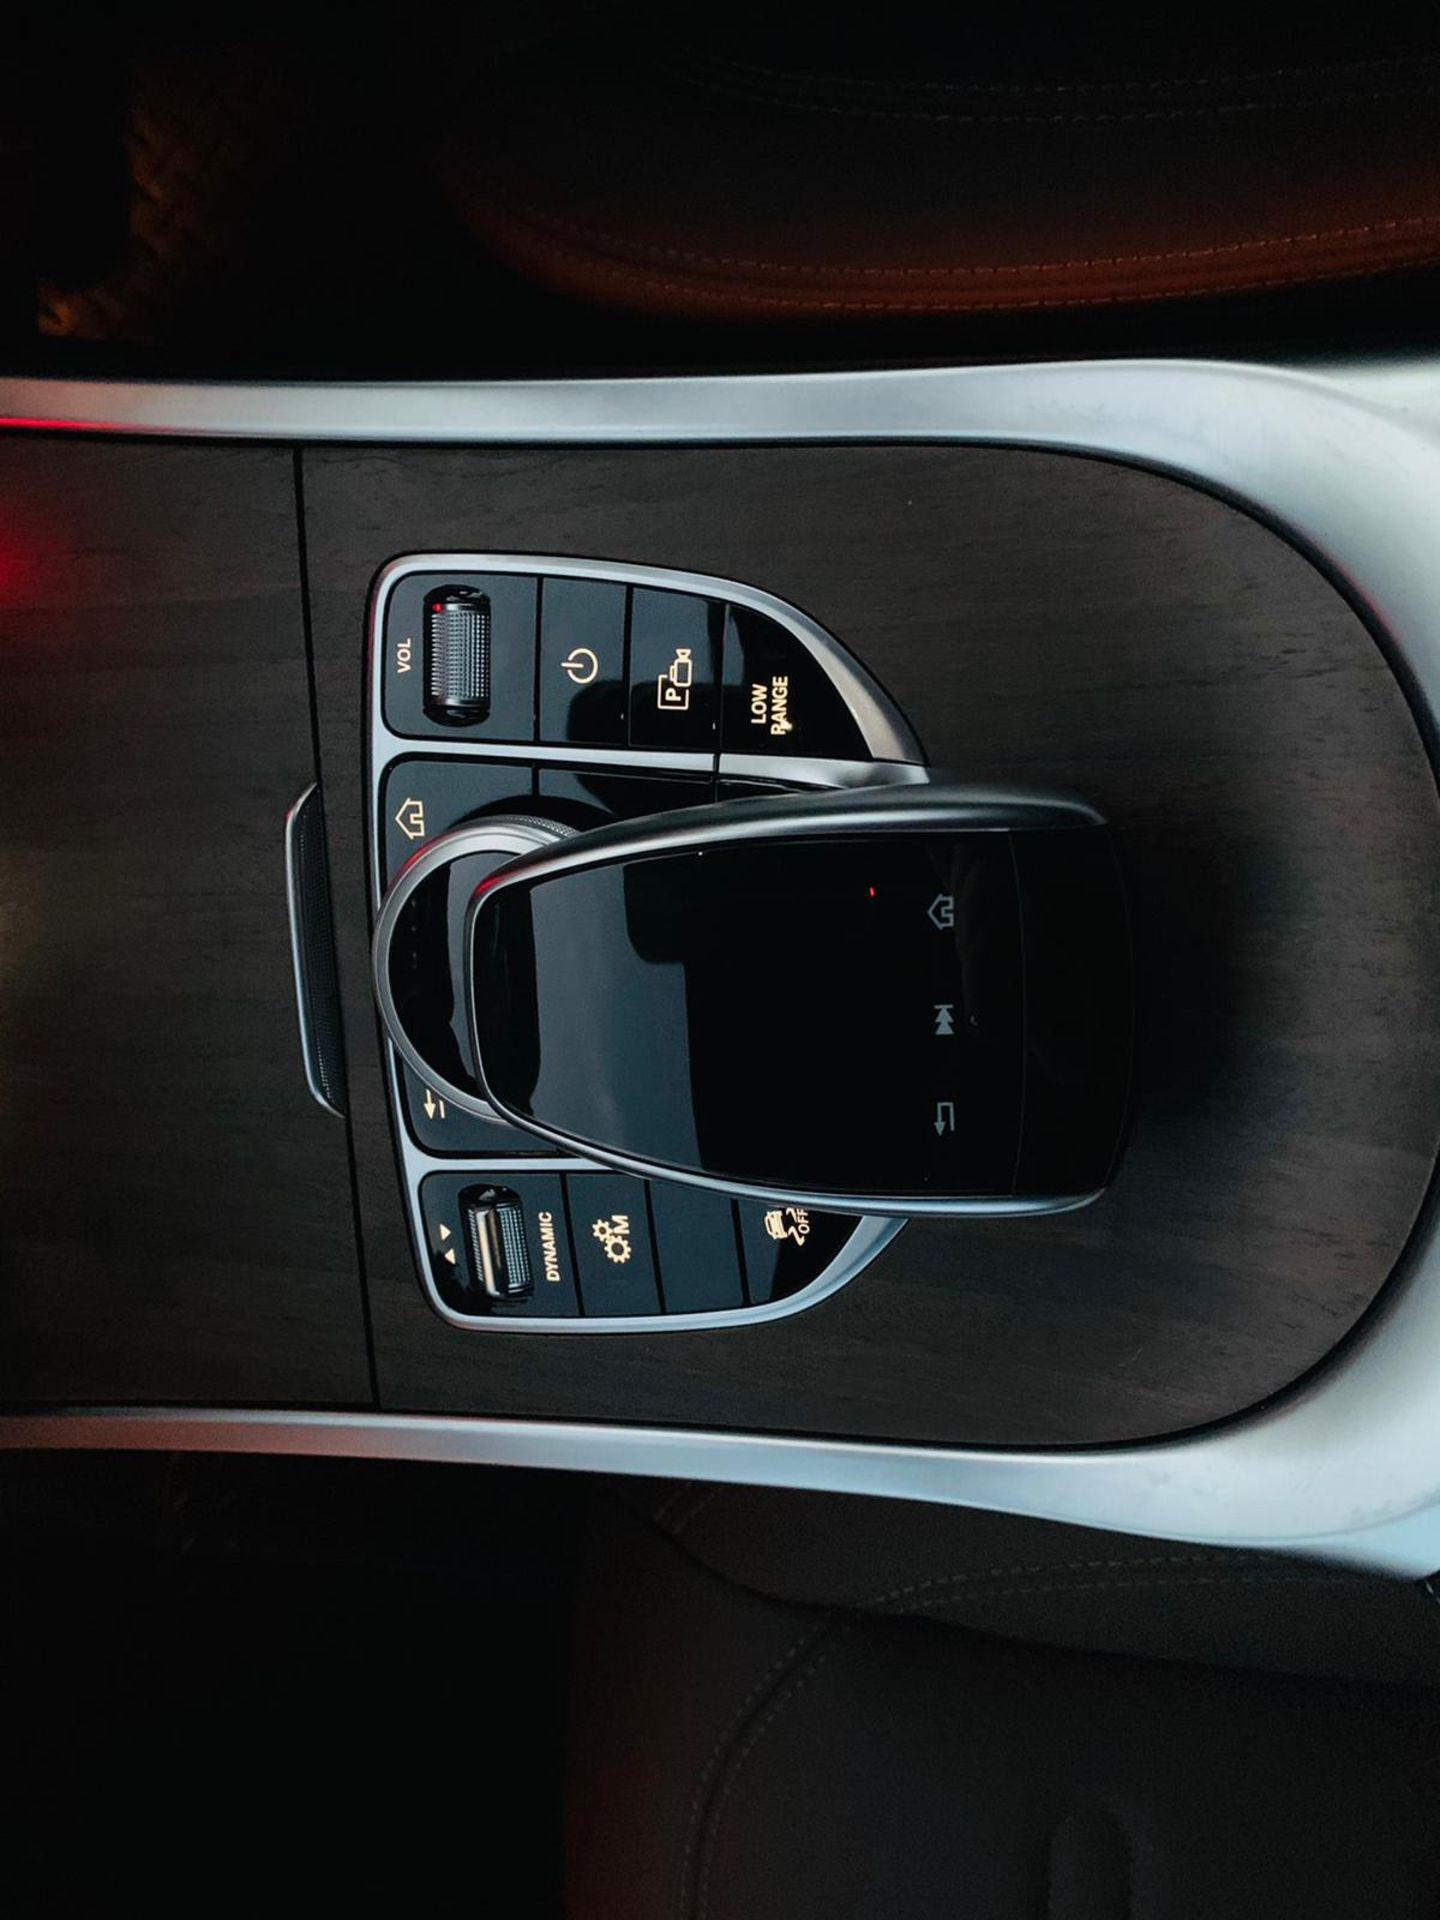 Mercedes G350d AMG LINE 9G-Tronic+ 4Matic 2020 20 Reg - 1 Owner - Only 9k Miles - HUGE SPEC - Image 27 of 41